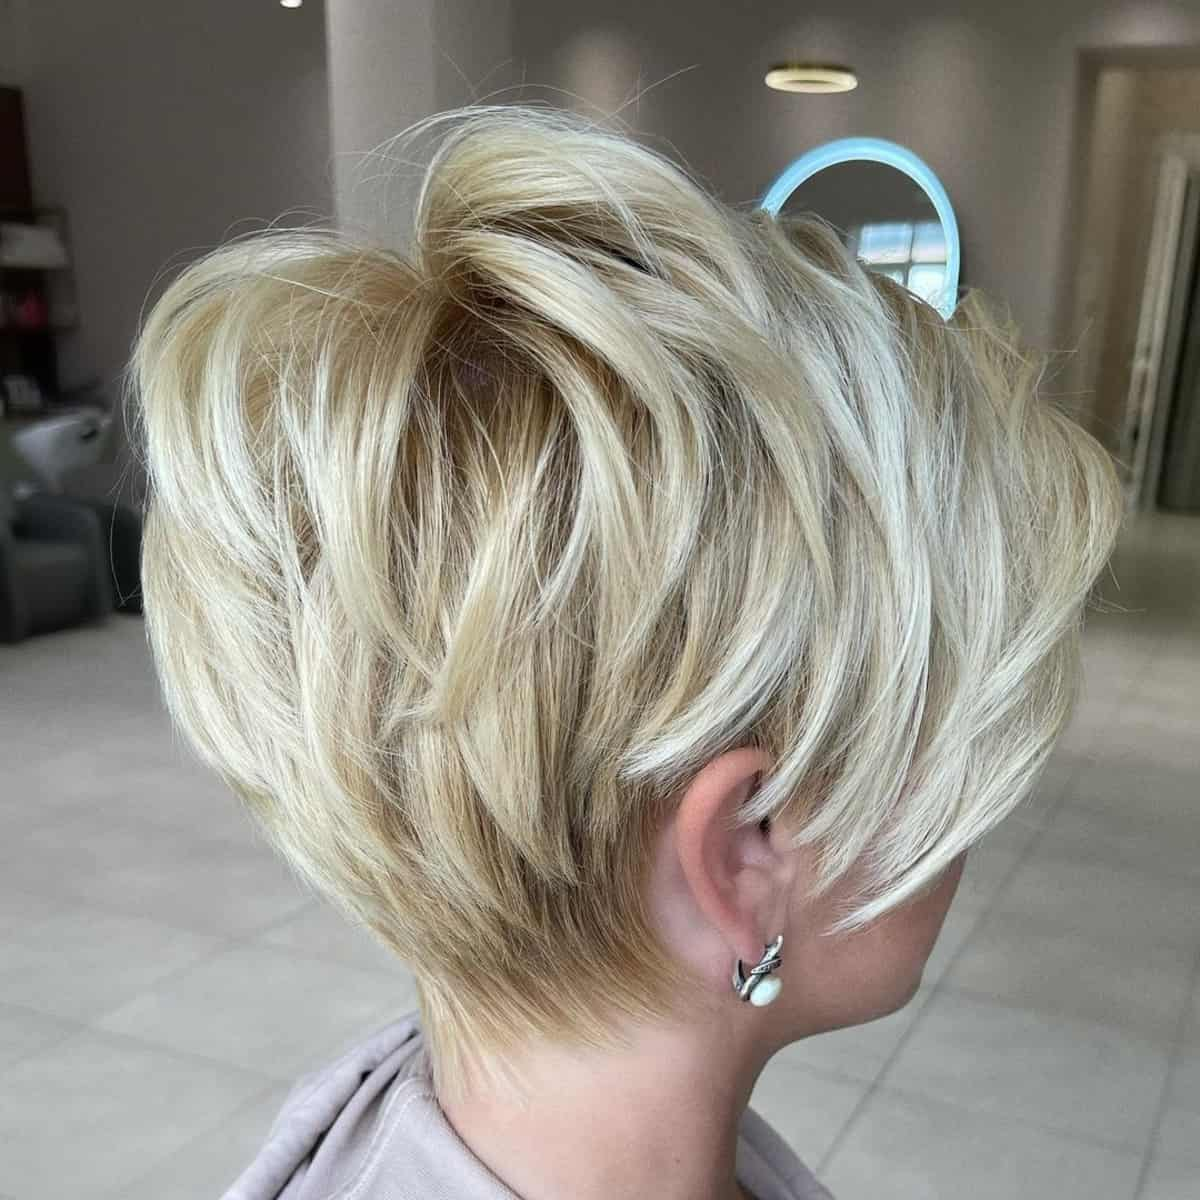 Blonde layered long pixie cut